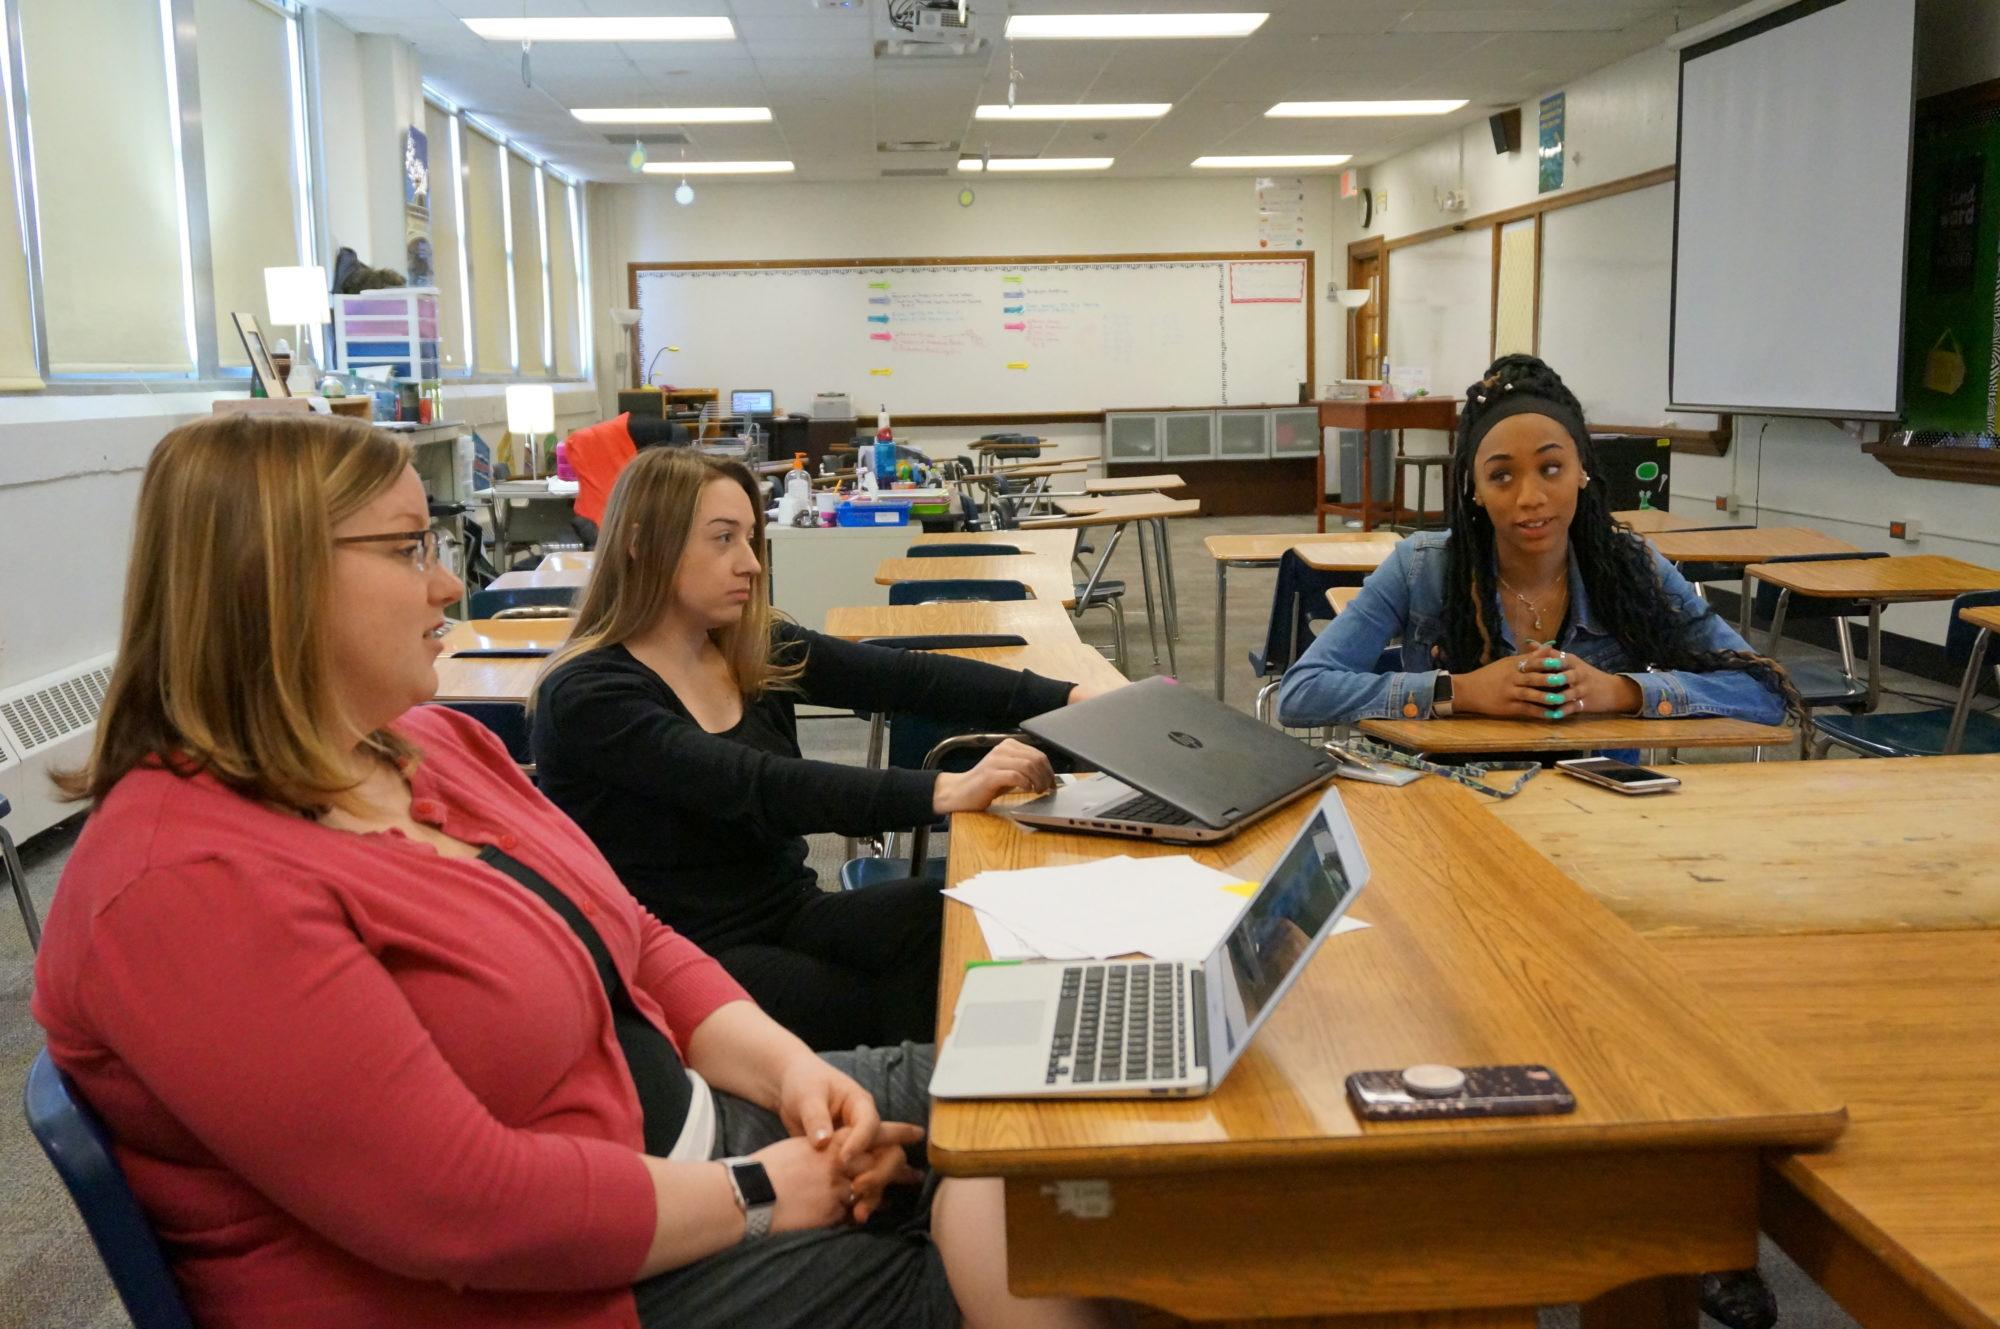 Teachers at Crispus Attucks High School